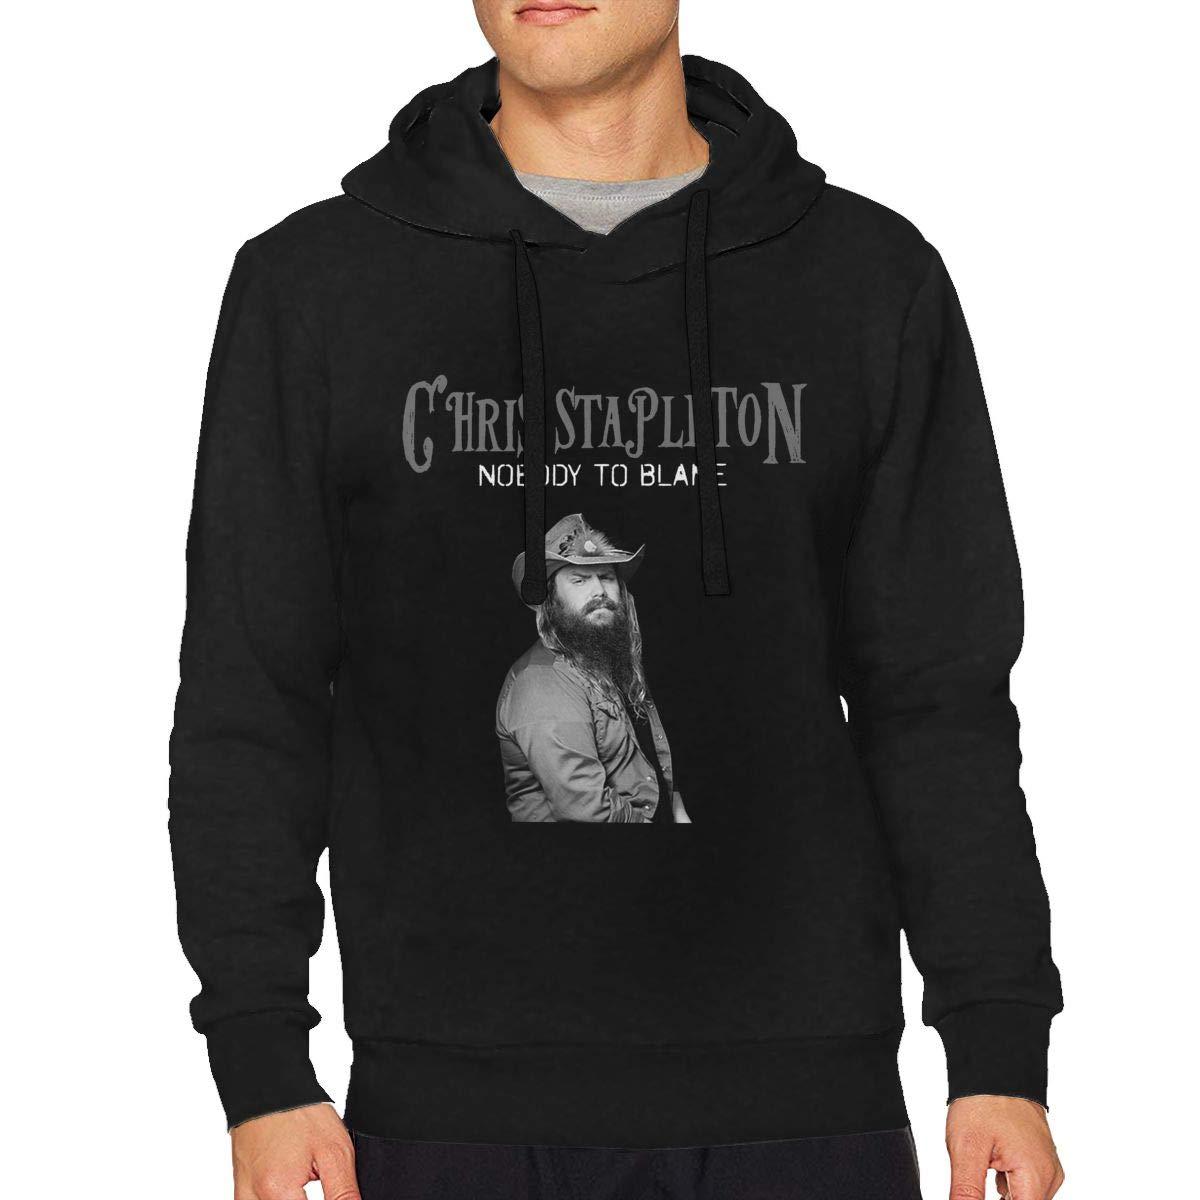 Theresat Clodfelter Chris Stapleton Nobody To Blame Classic Music Band S Pullov Shirts